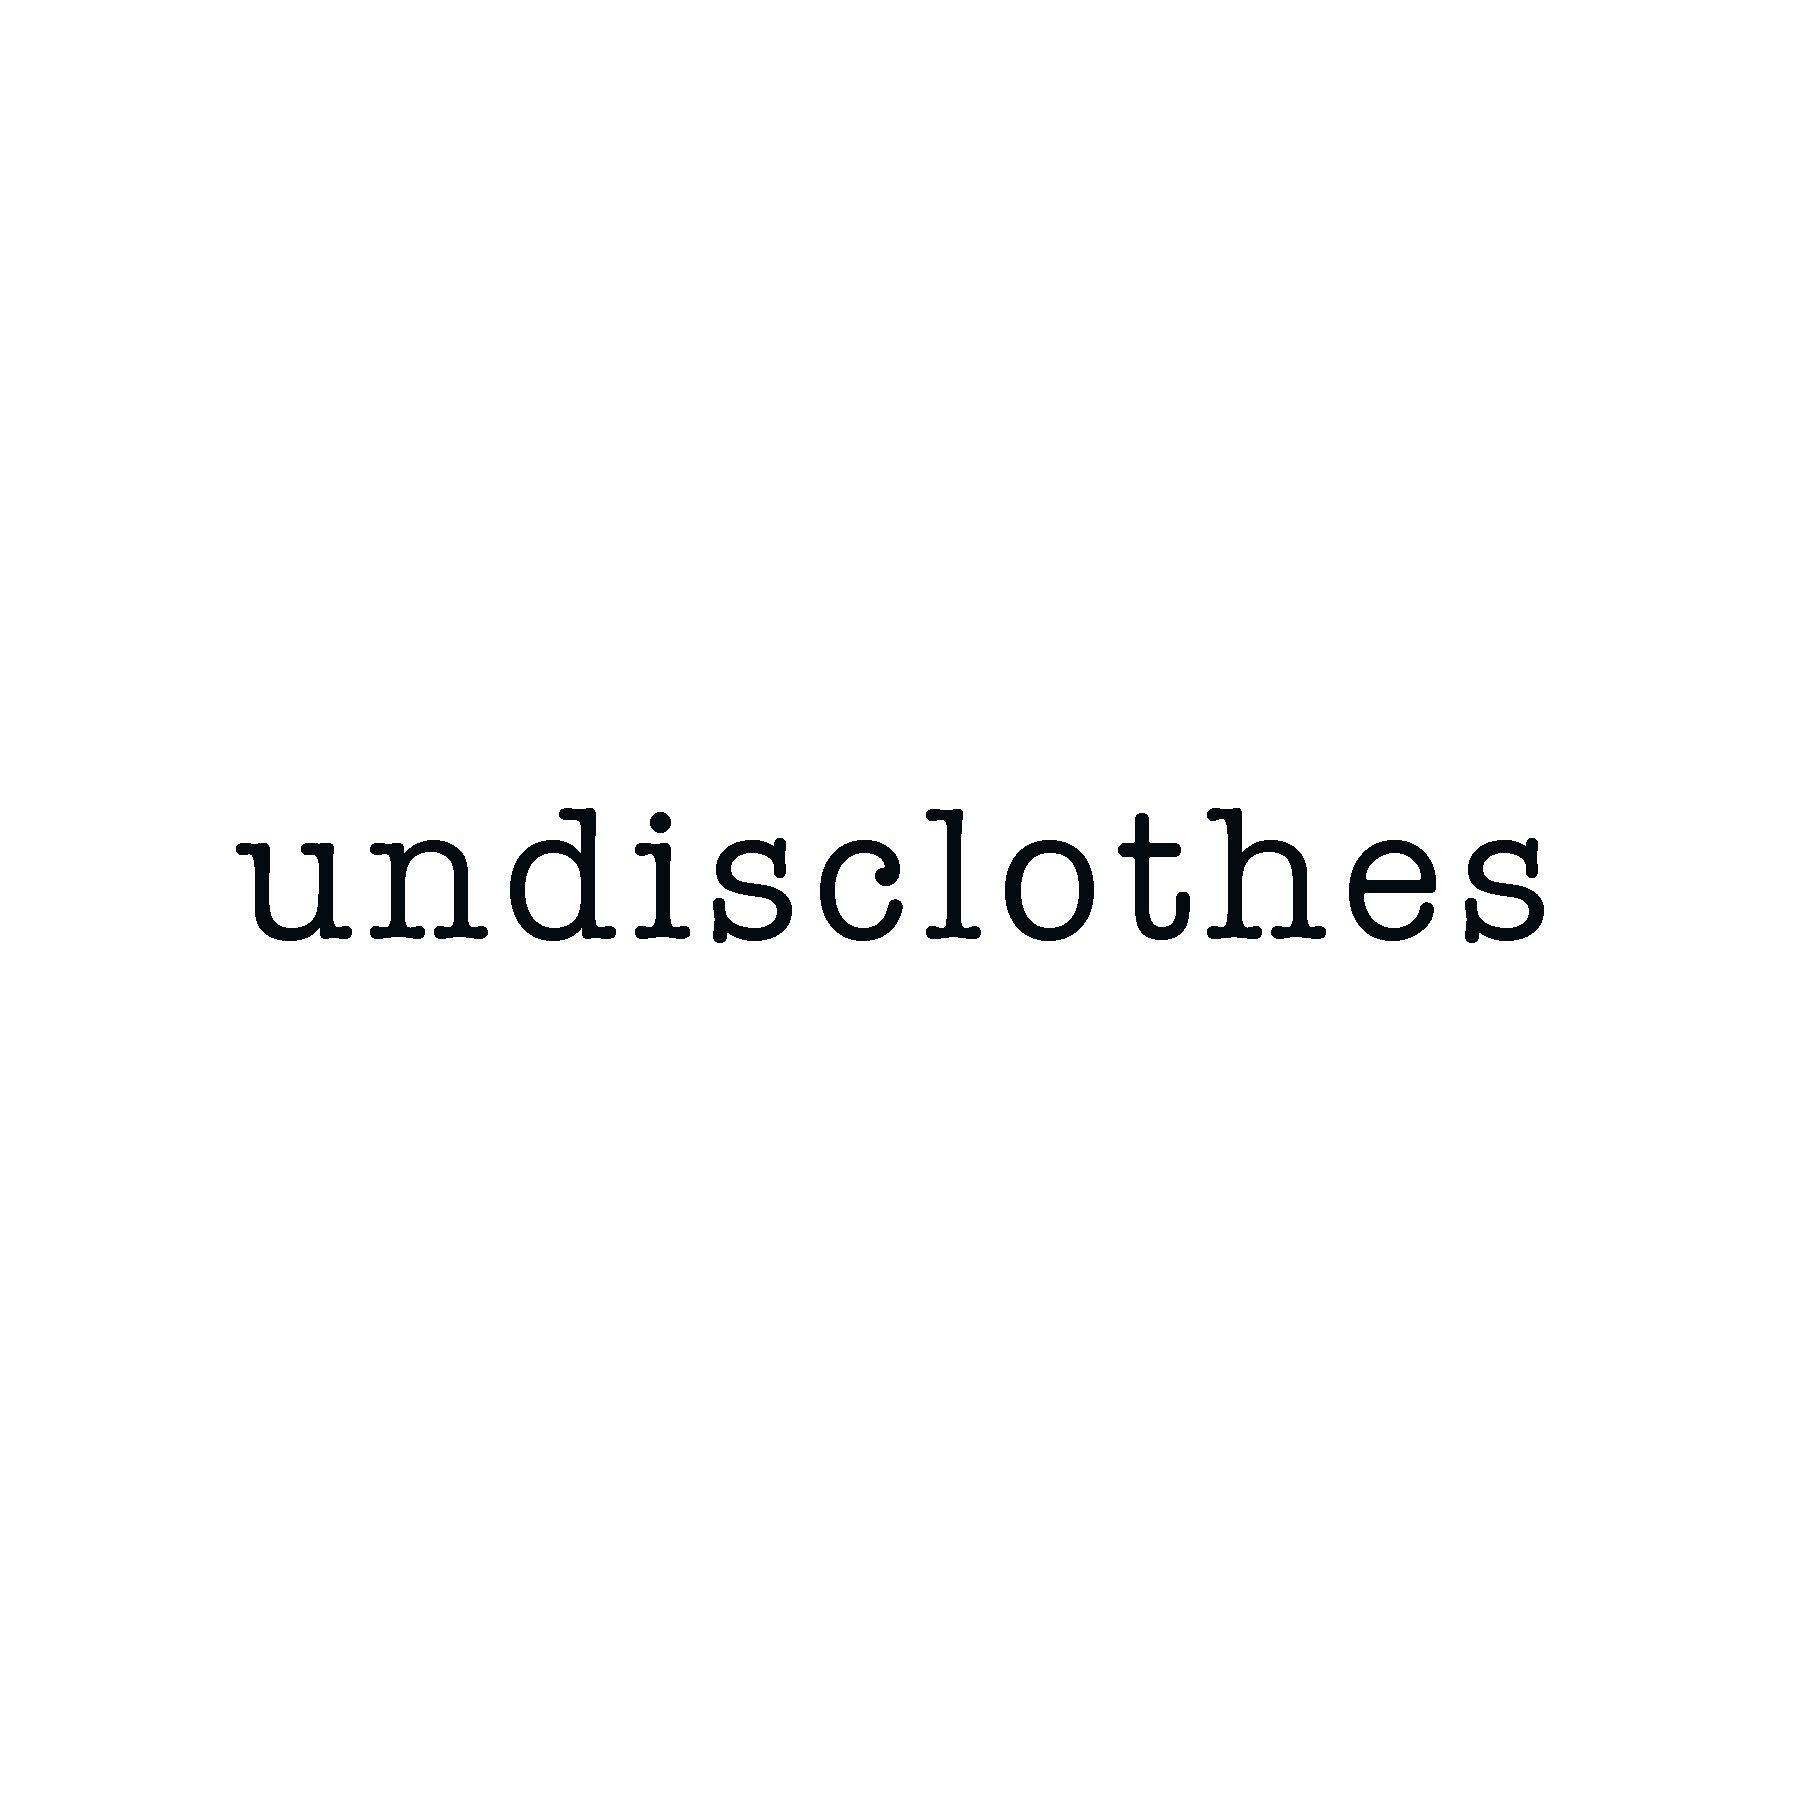 undisclothes